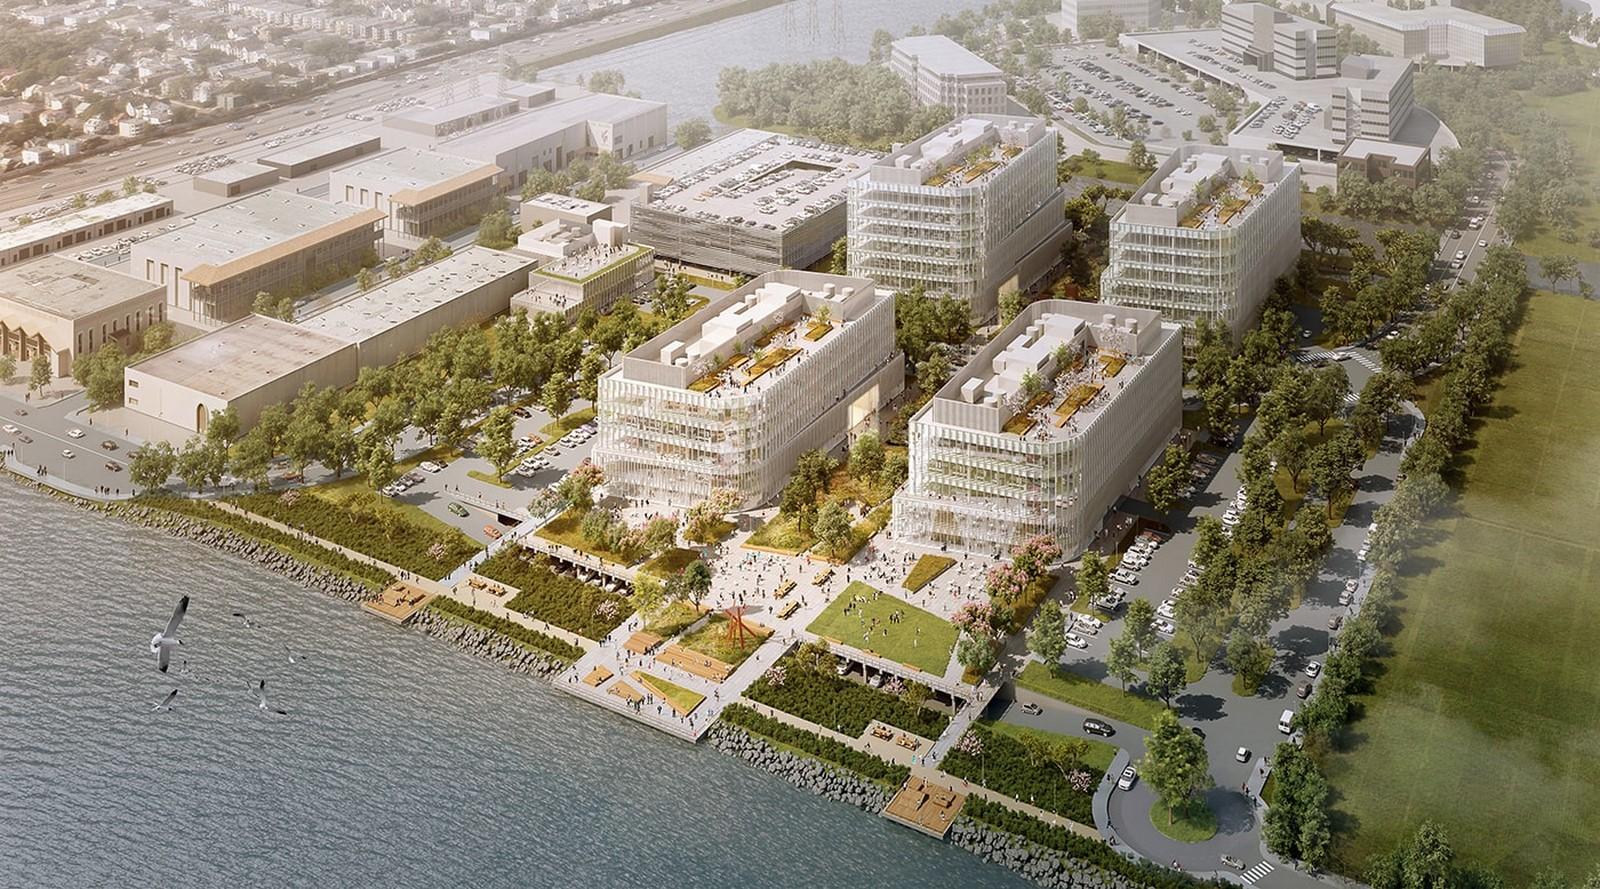 Gensler- 10 Cities & Urban Design Projects Sheet30